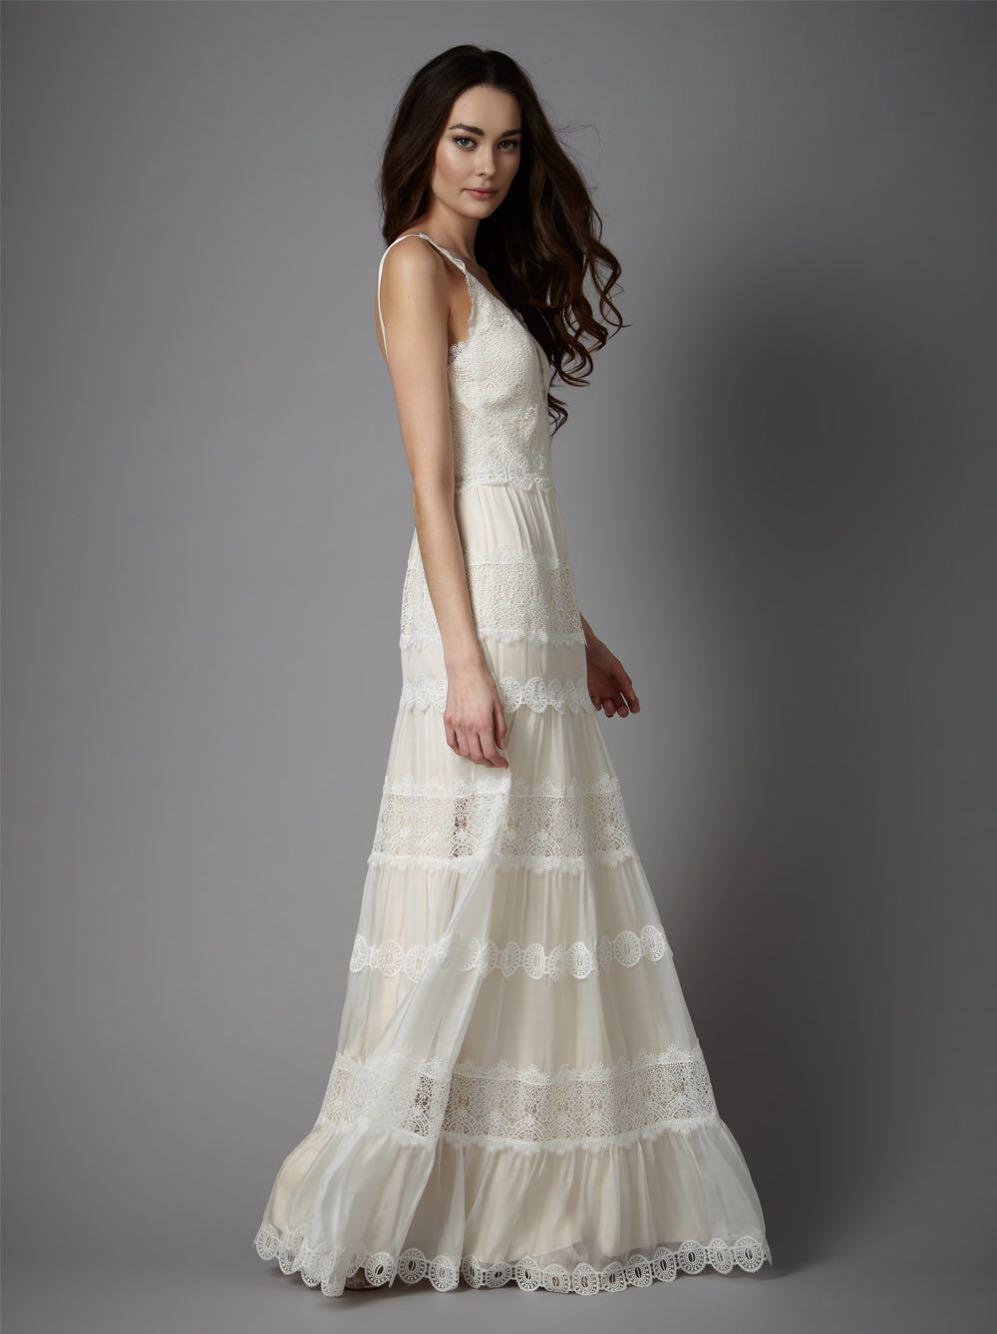 Genevieve wedding dress